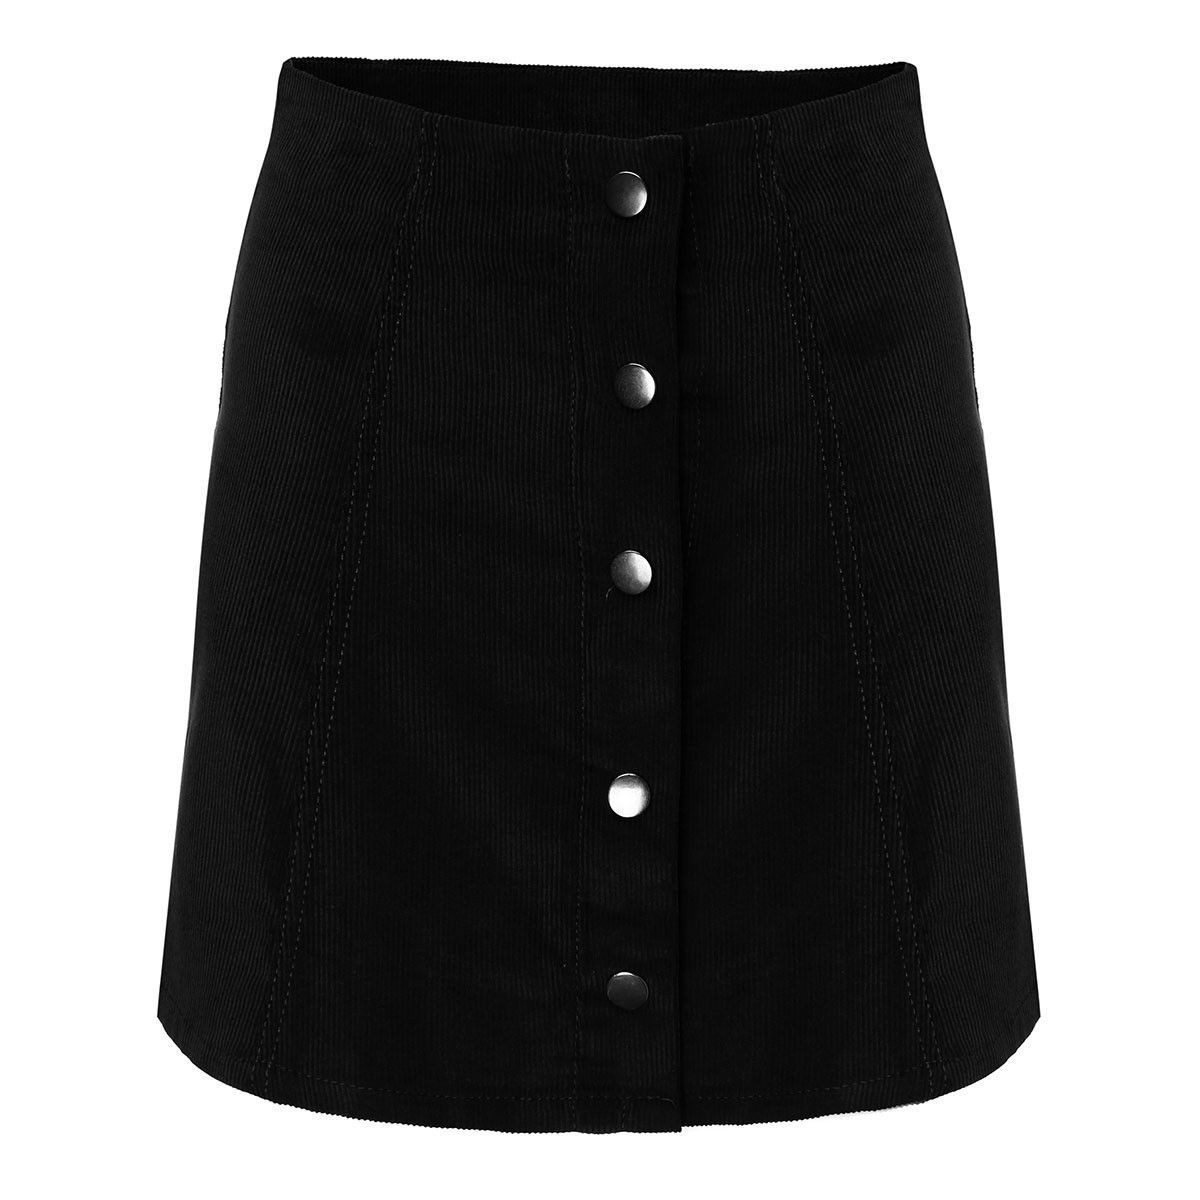 Summer Skirt Fashion Women Skater Vintage Corduroy Front Button A-Line Mini Skirt femme European Style S-XL